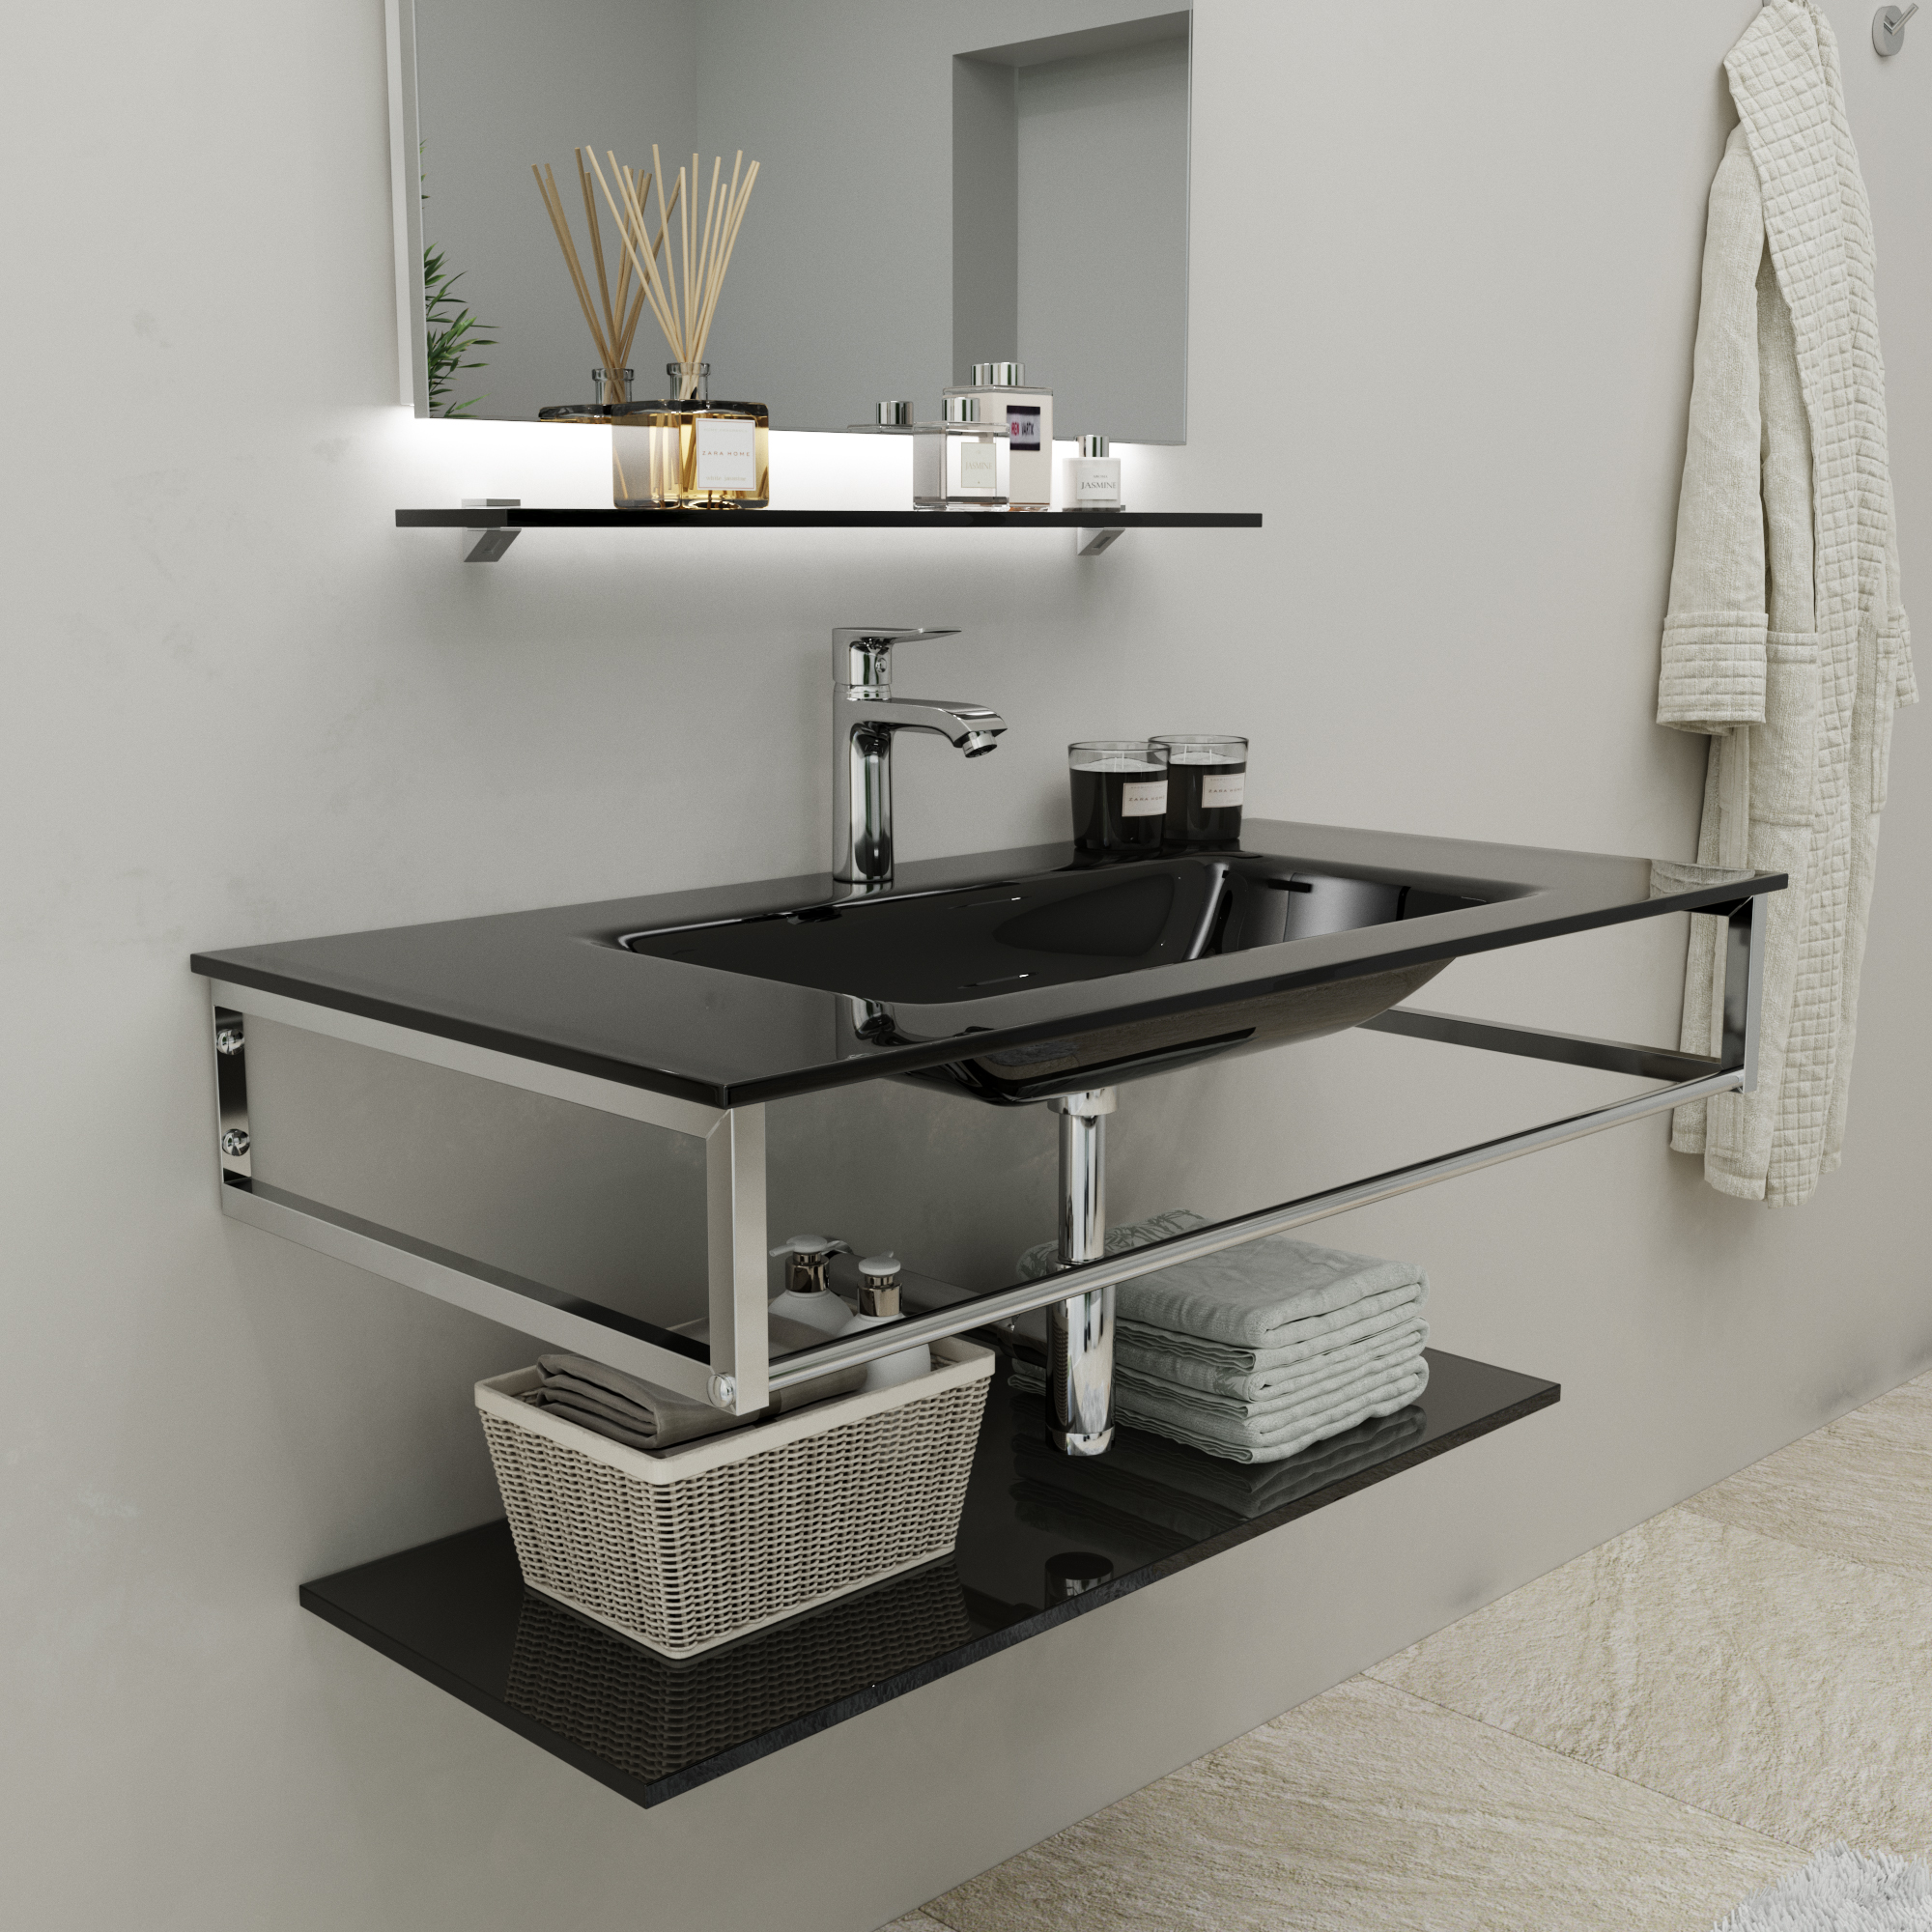 Wall-Mount Bracket and Vanity Unit Sink